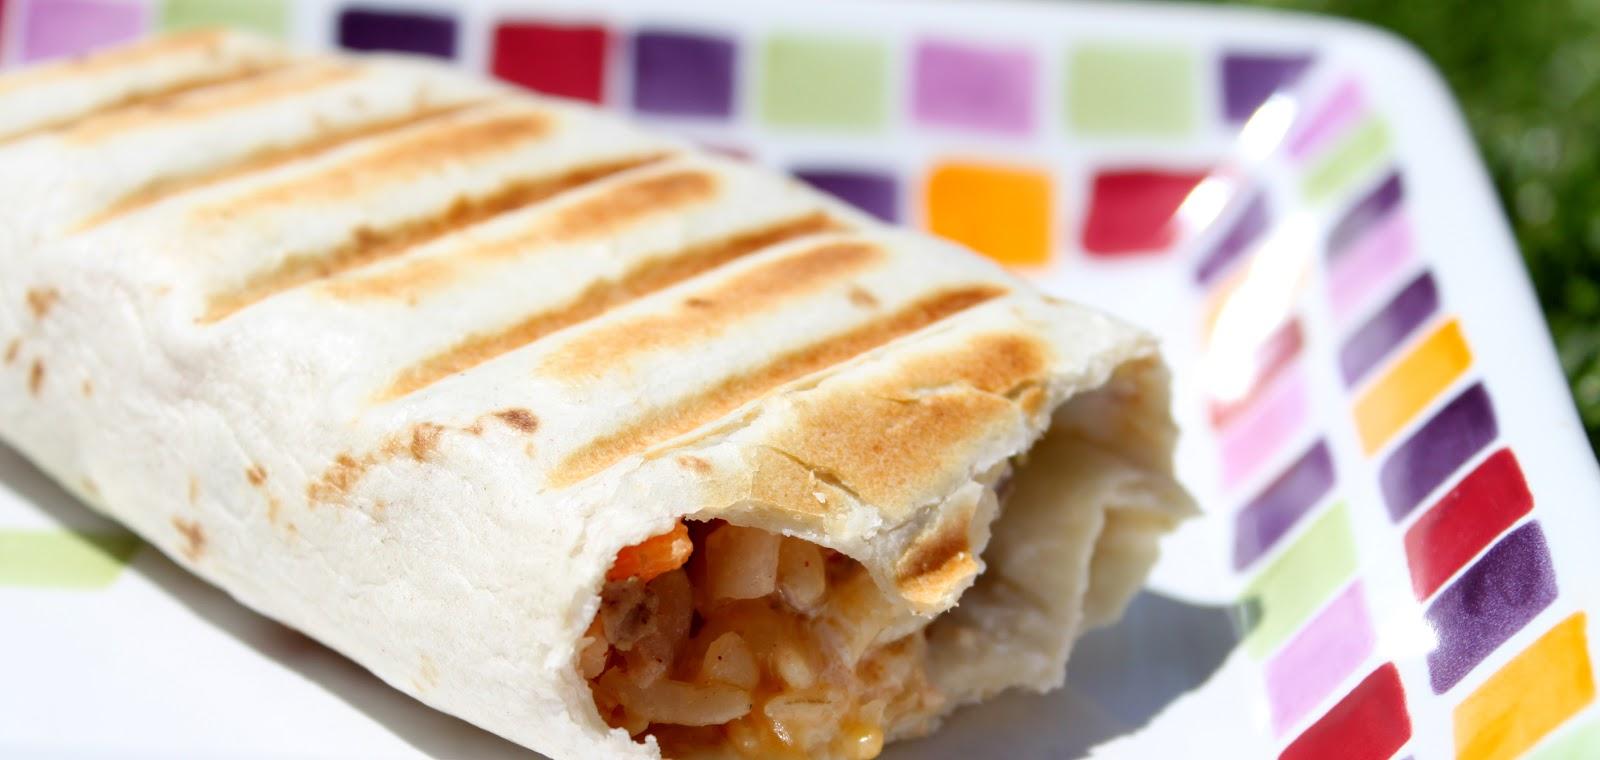 Fried Chicken Joke Waterfront Properties Blog: Grilled Stuffed Burrito Recipe